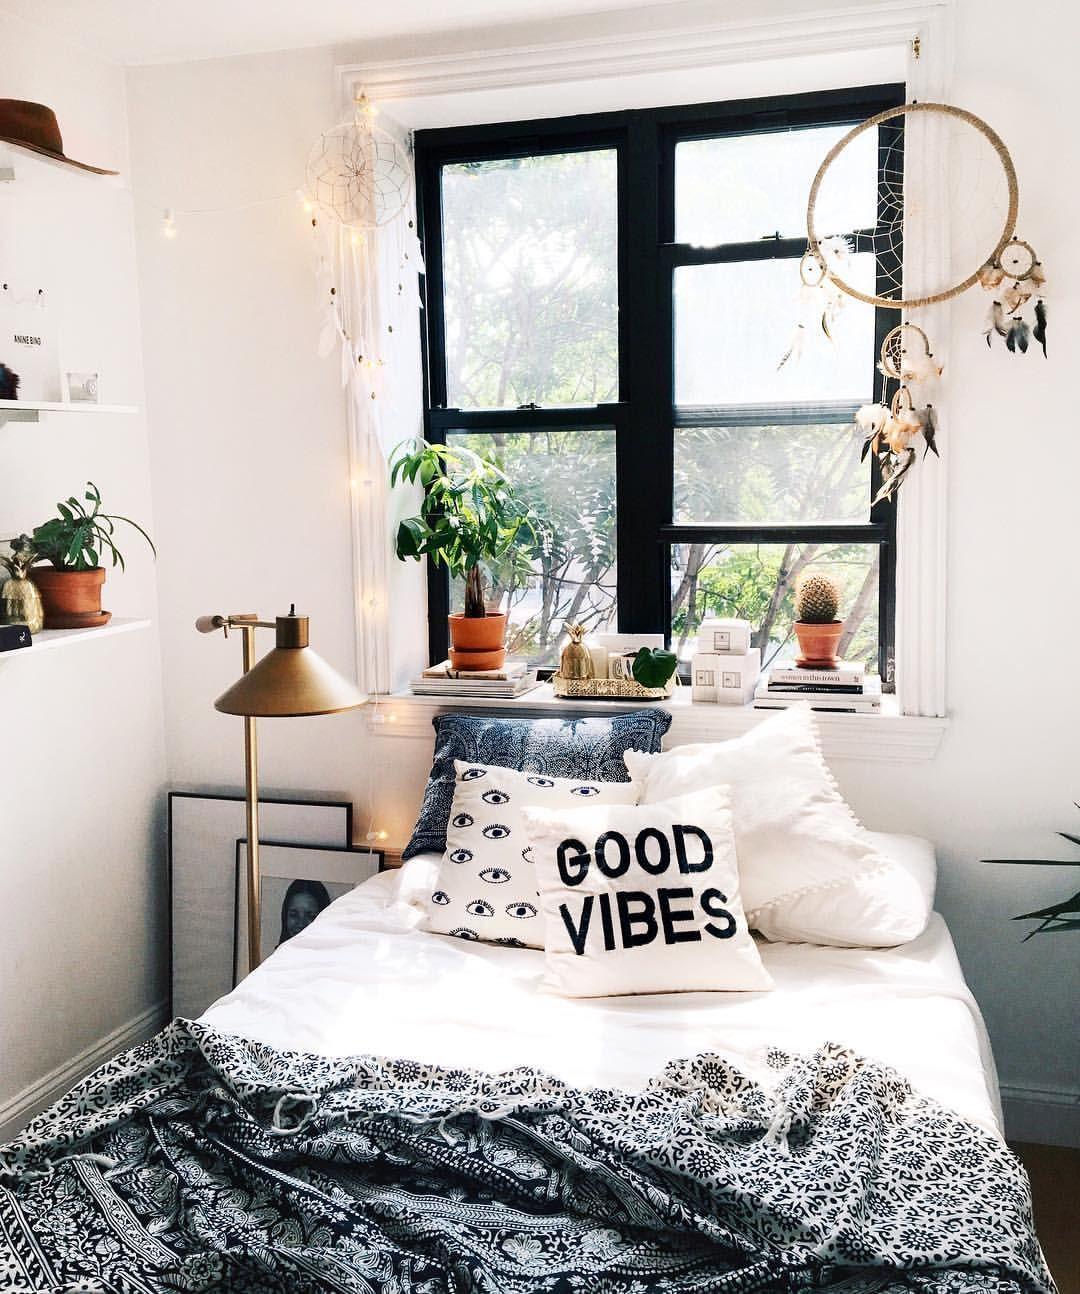 Color Schemes For Master Bedroom Black And White Gloss Bedroom Furniture Bedroom Bedspreads Bedroom Carpet Uk: Pin By - ̗̀claire ̖́- On ☞ Haven